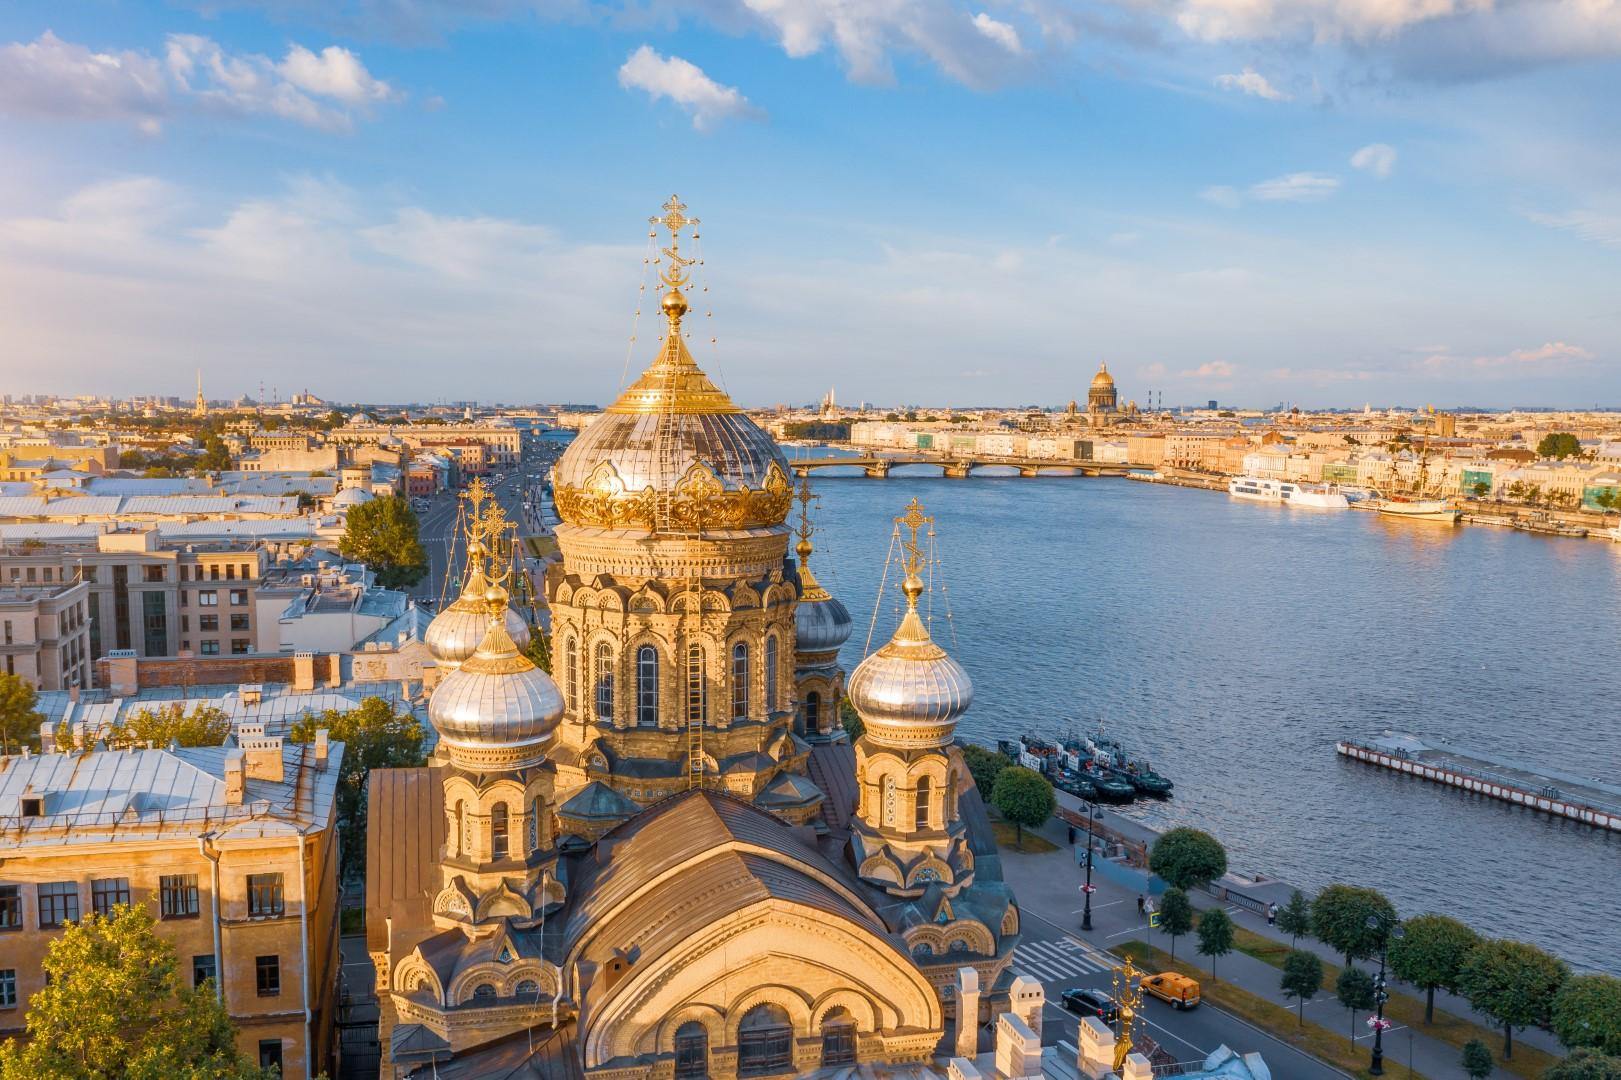 Jedinečné krásy Petrohradu a okolí